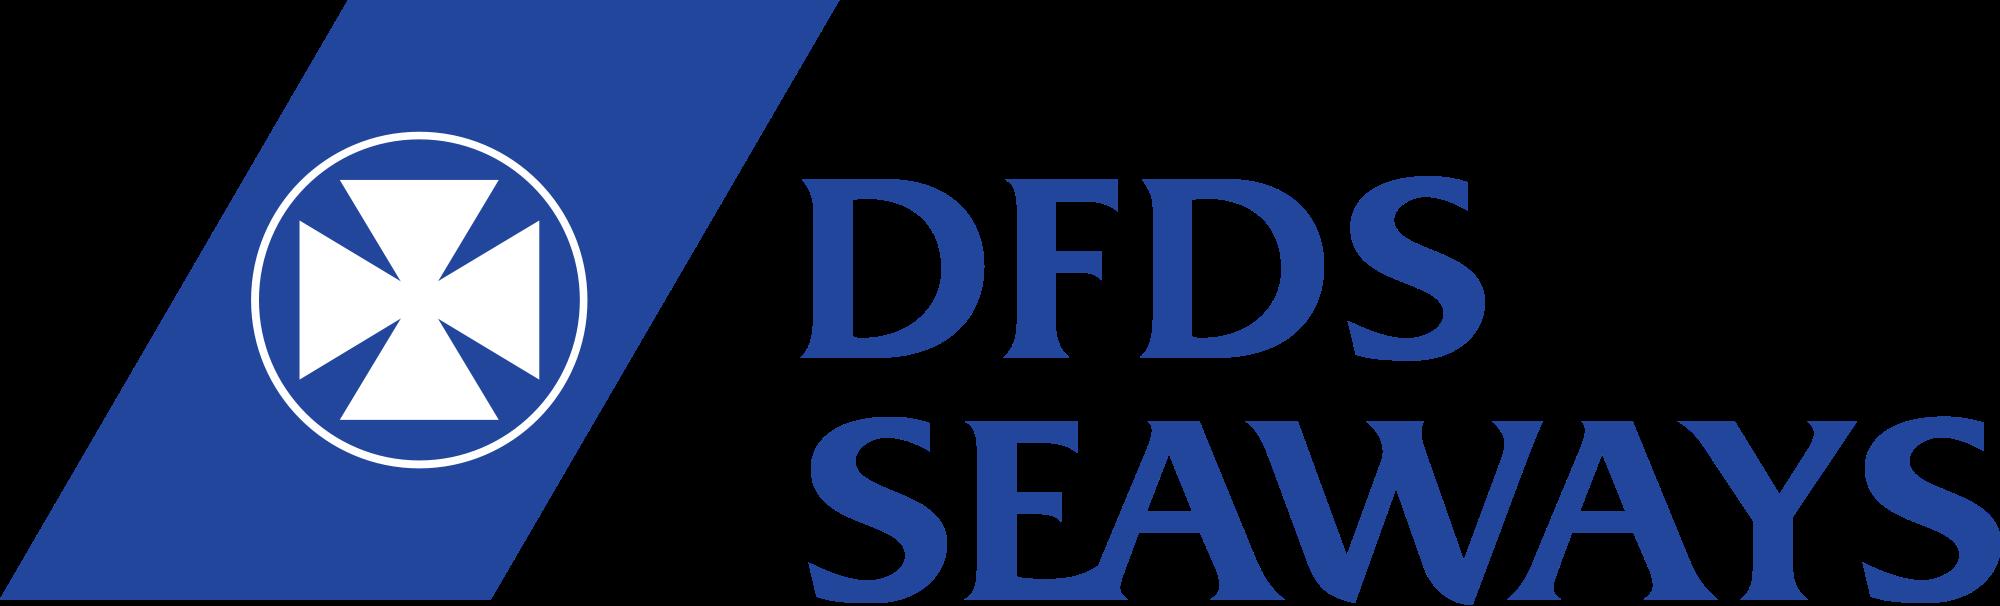 Dfds_seaways_logo